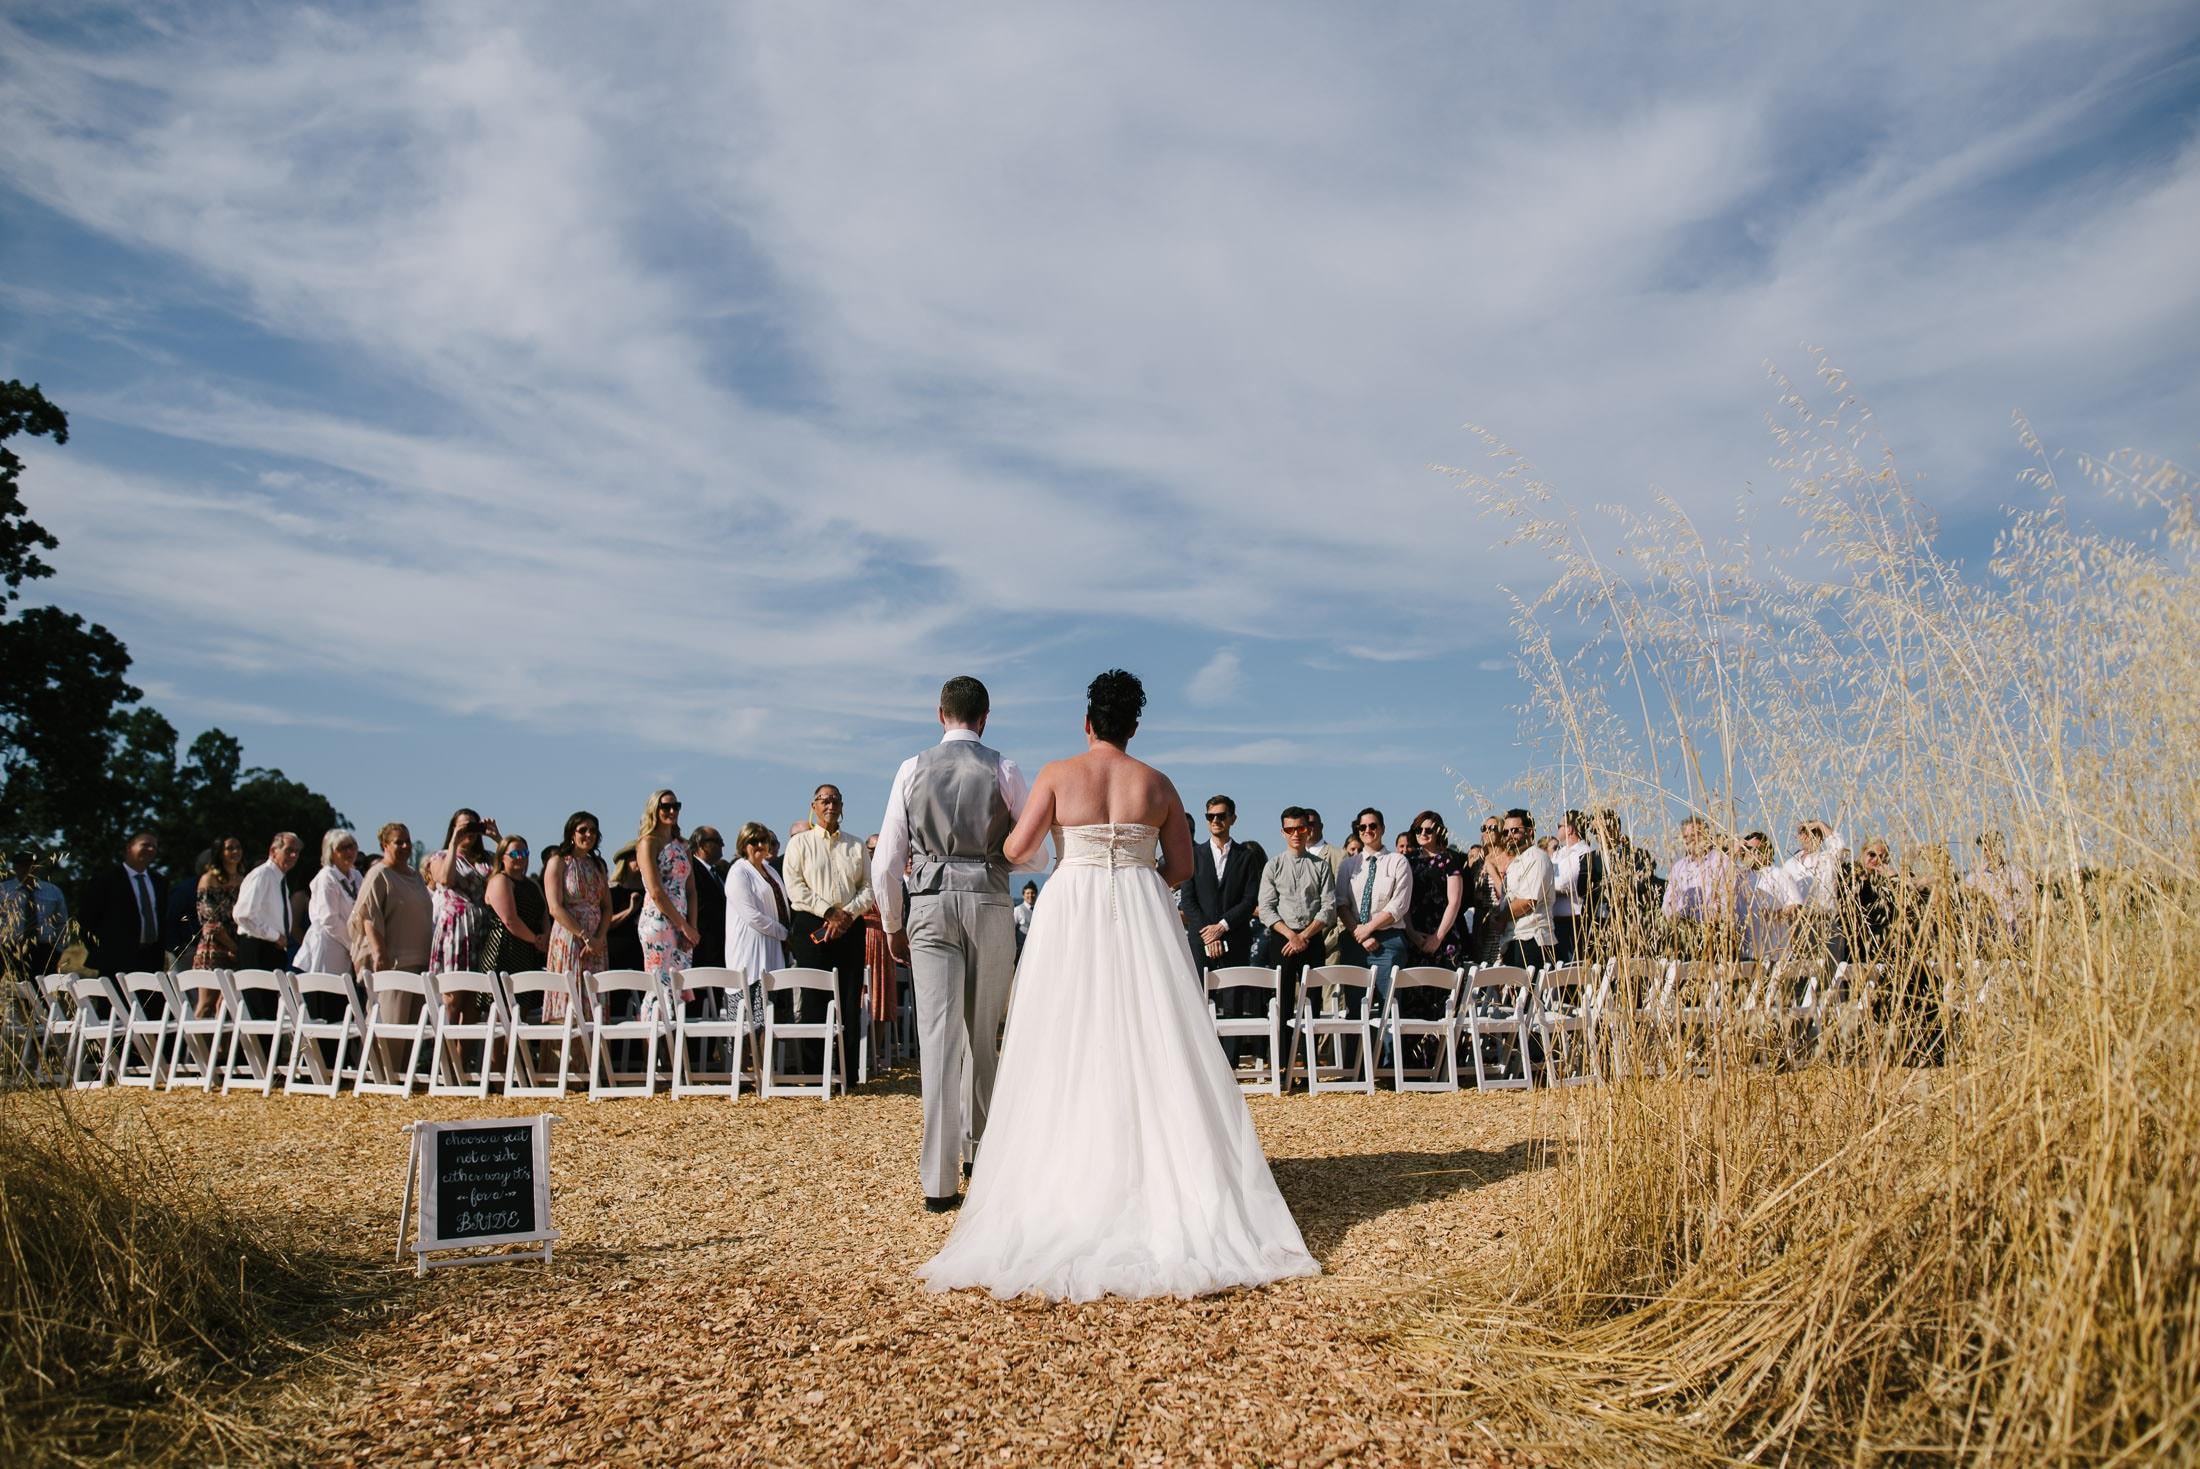 Sebastopol Same Sex Wedding Ceremony